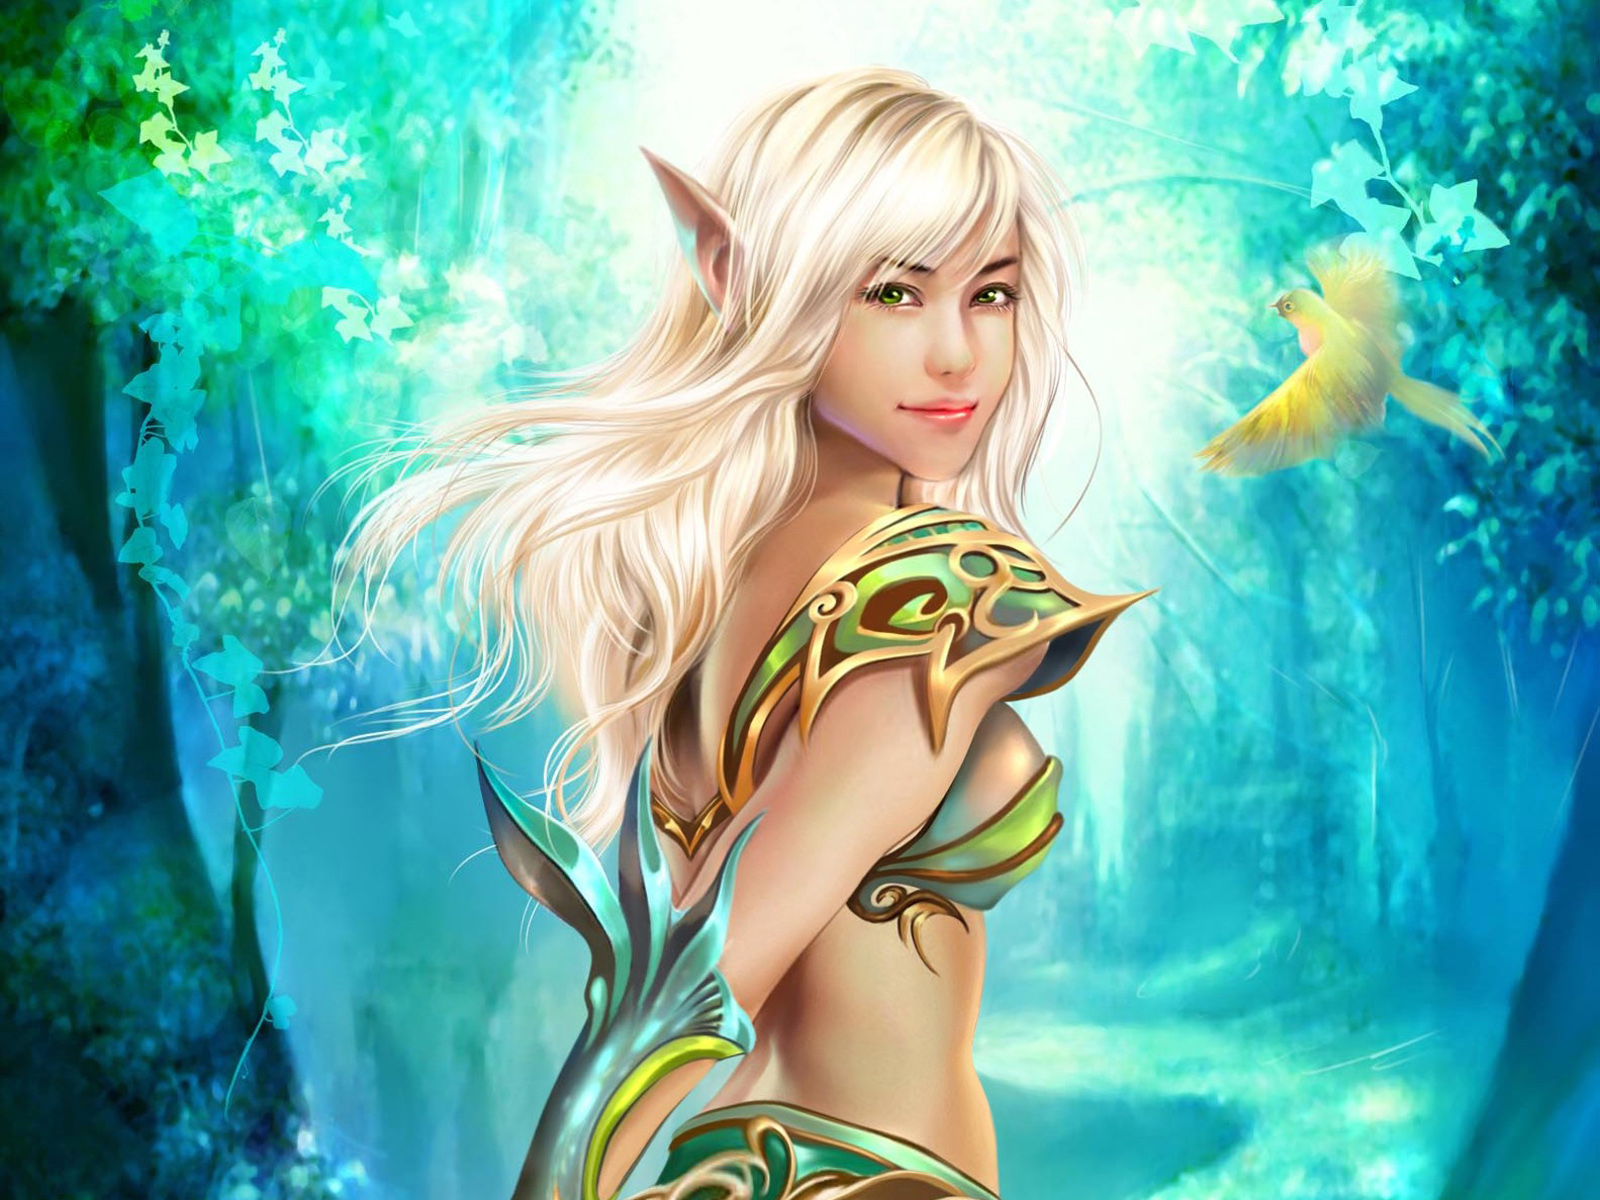 Картинки эльфиек красивых